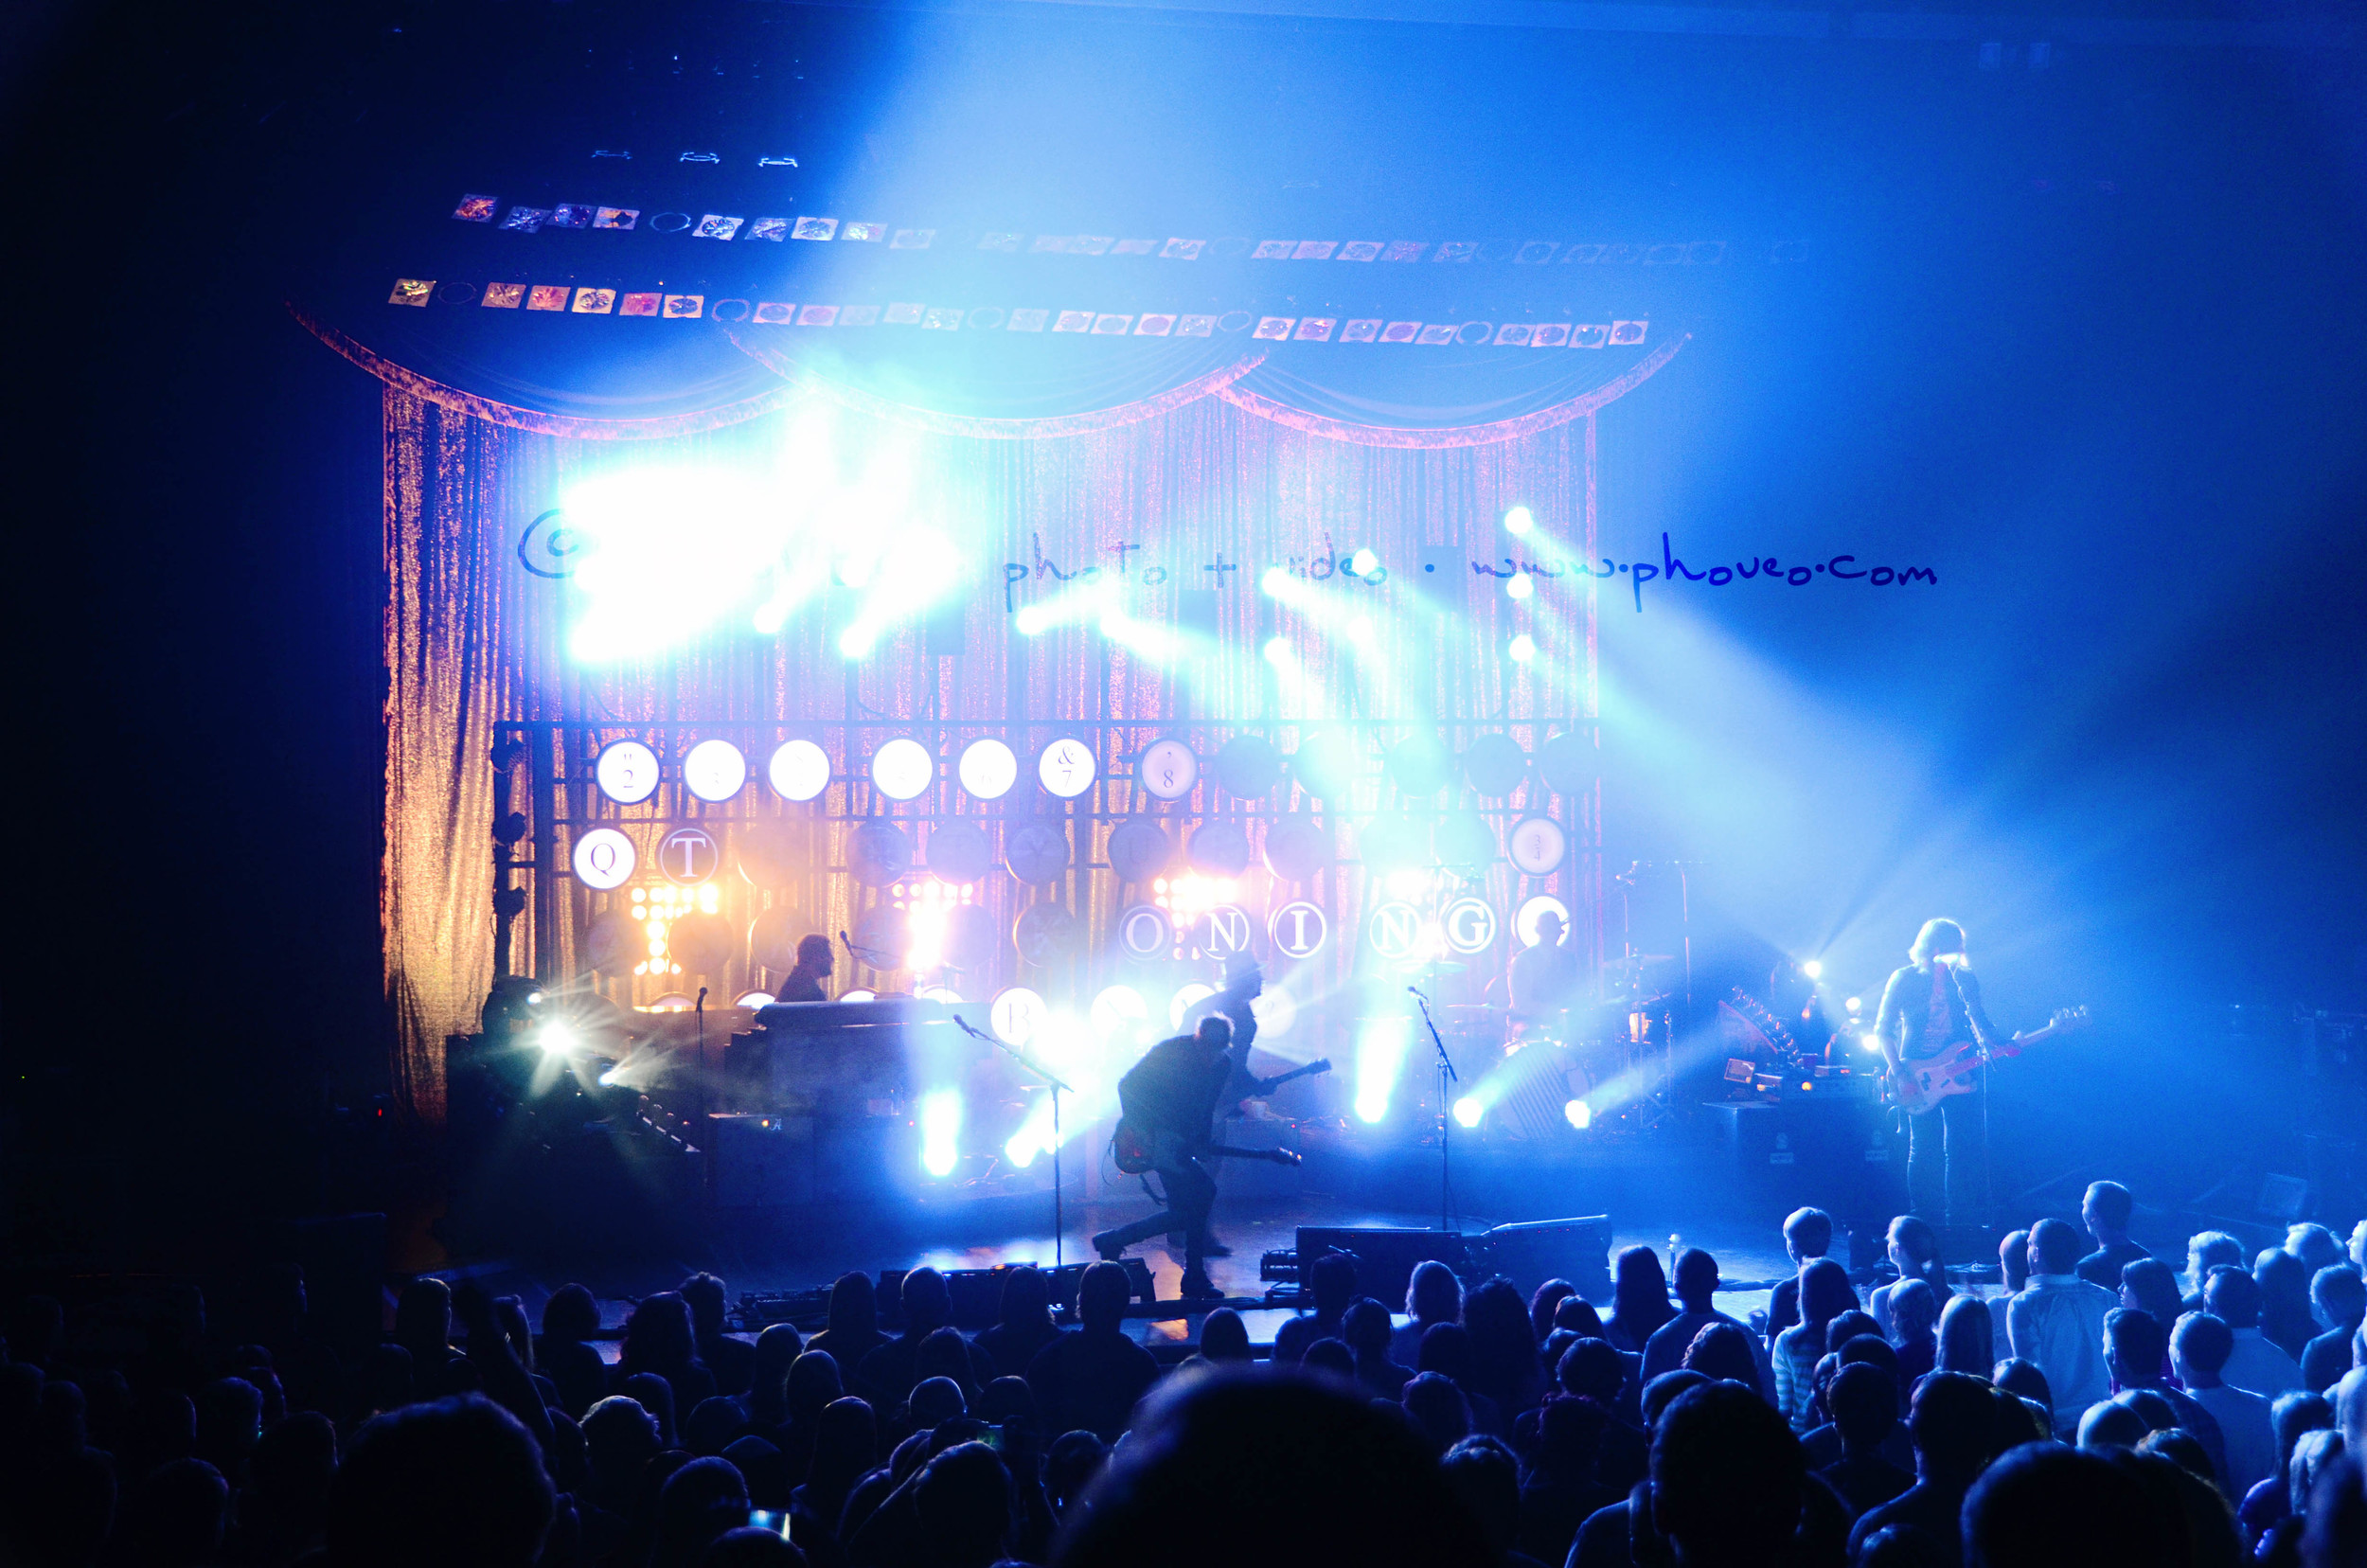 WM_concert1.jpg